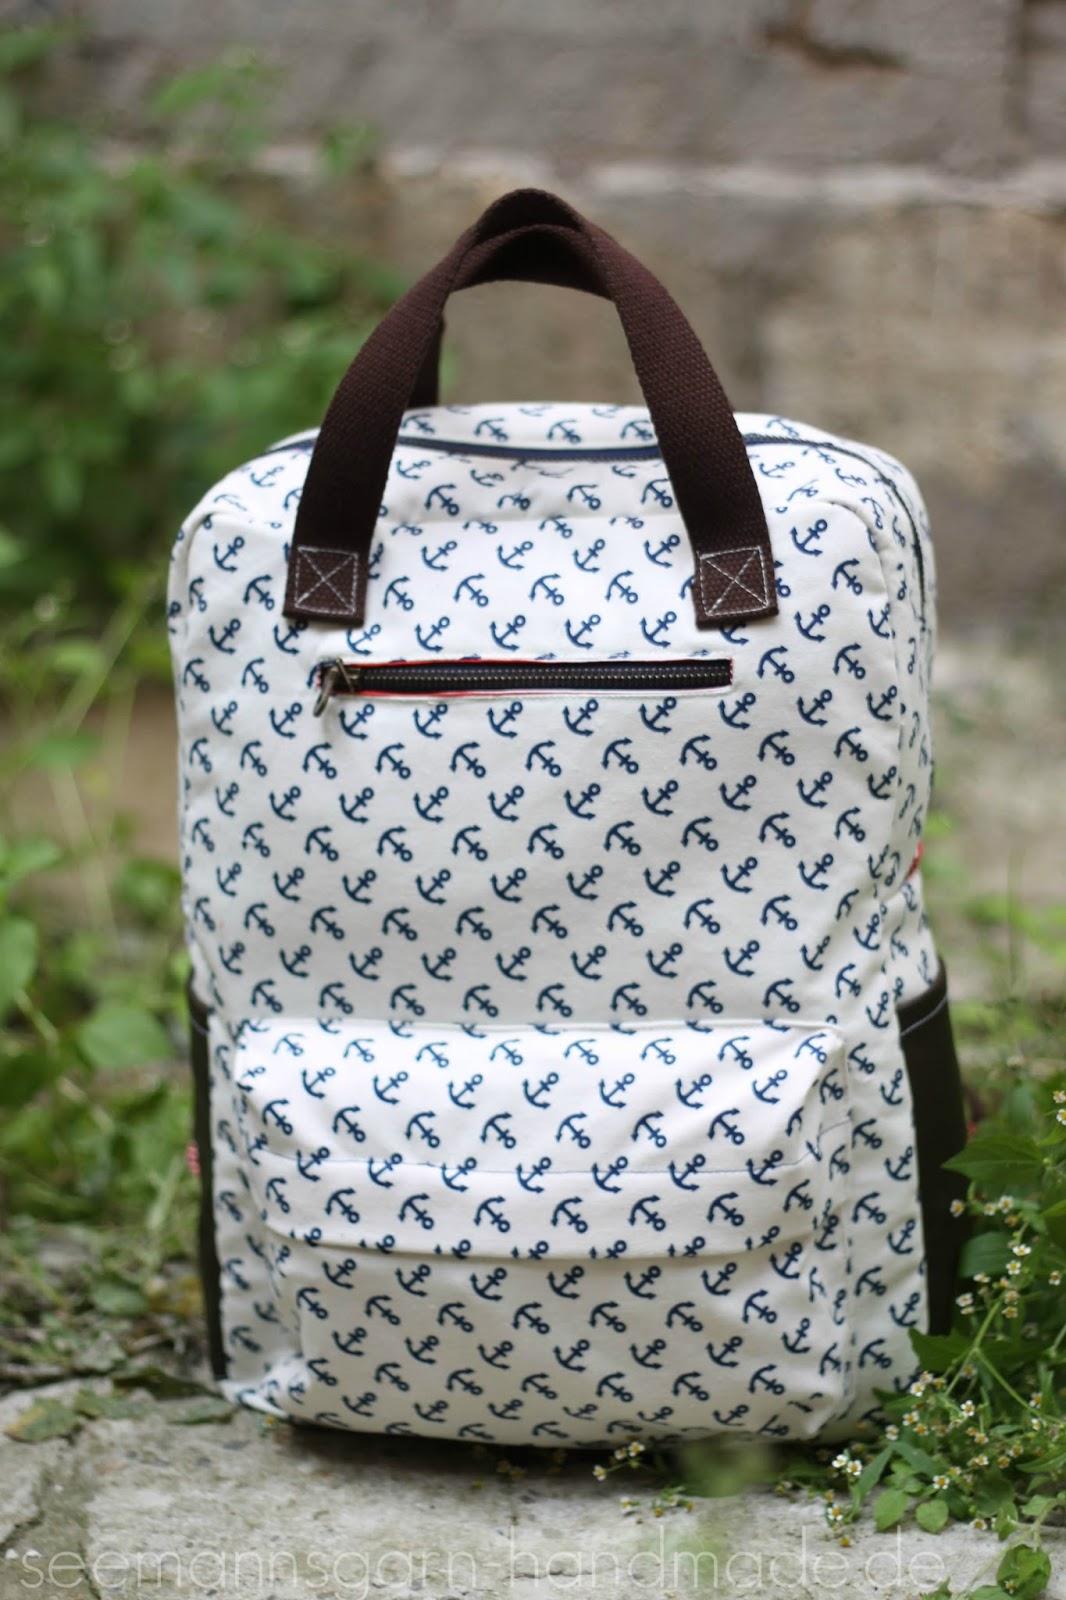 Anker-Rucksack, ahoi! • Vicky Backpack • Seemannsgarn - handmade